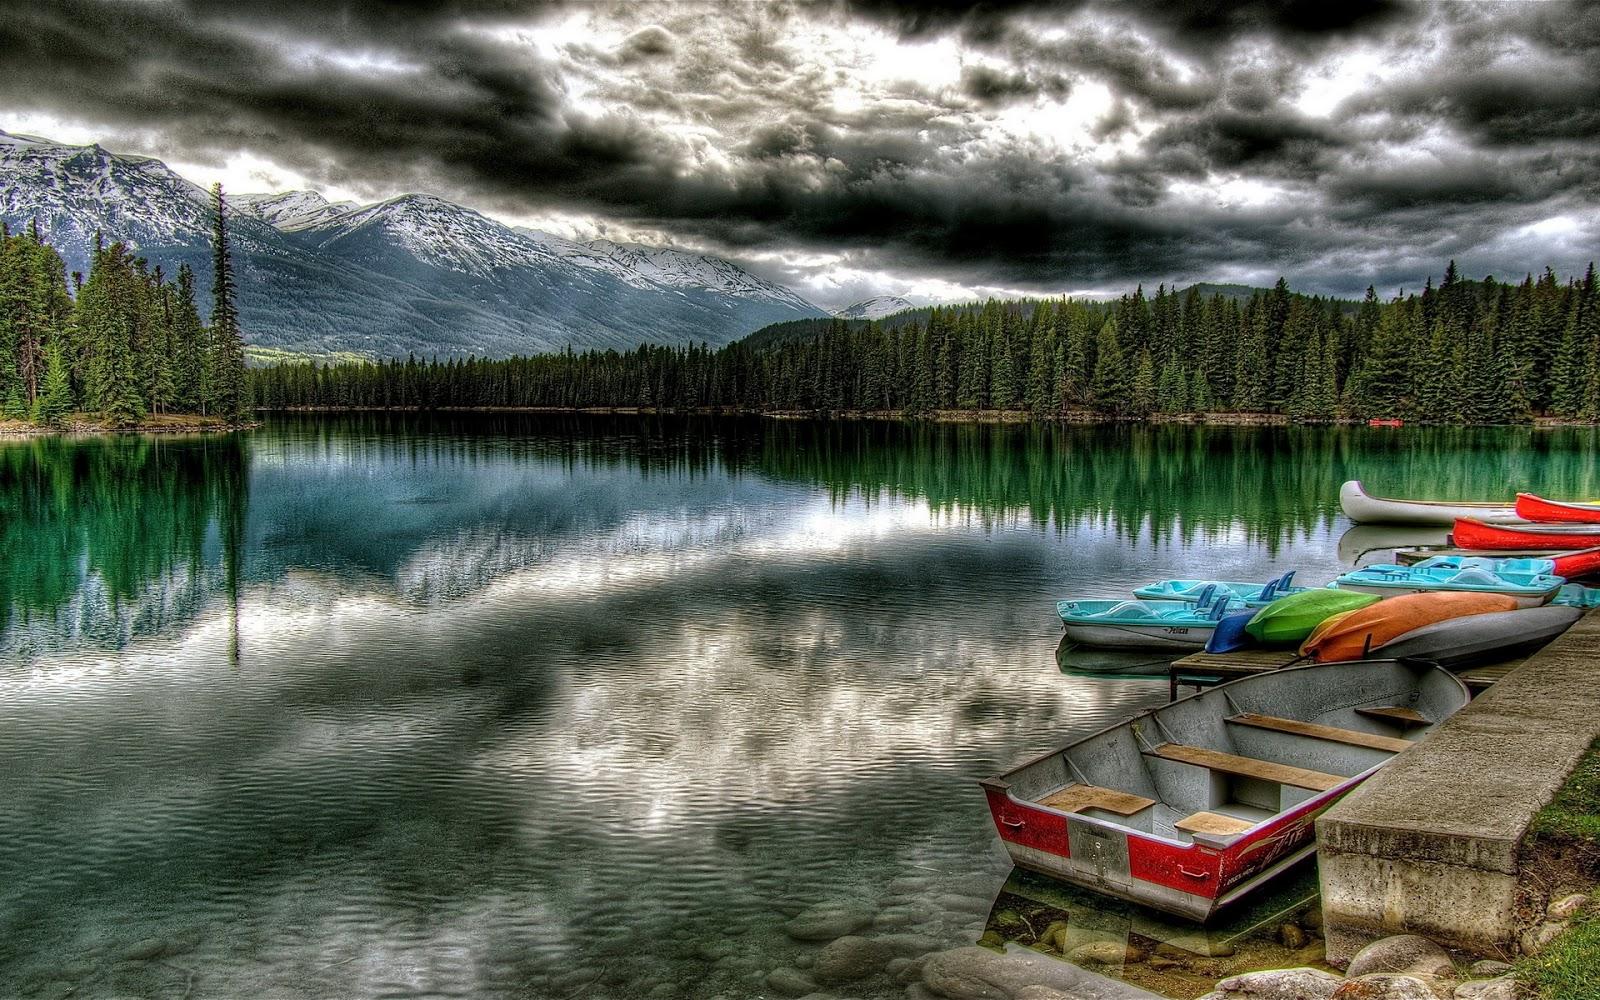 Beautiful Nature Hd Wallpapers 1080p Hd Wallpapery